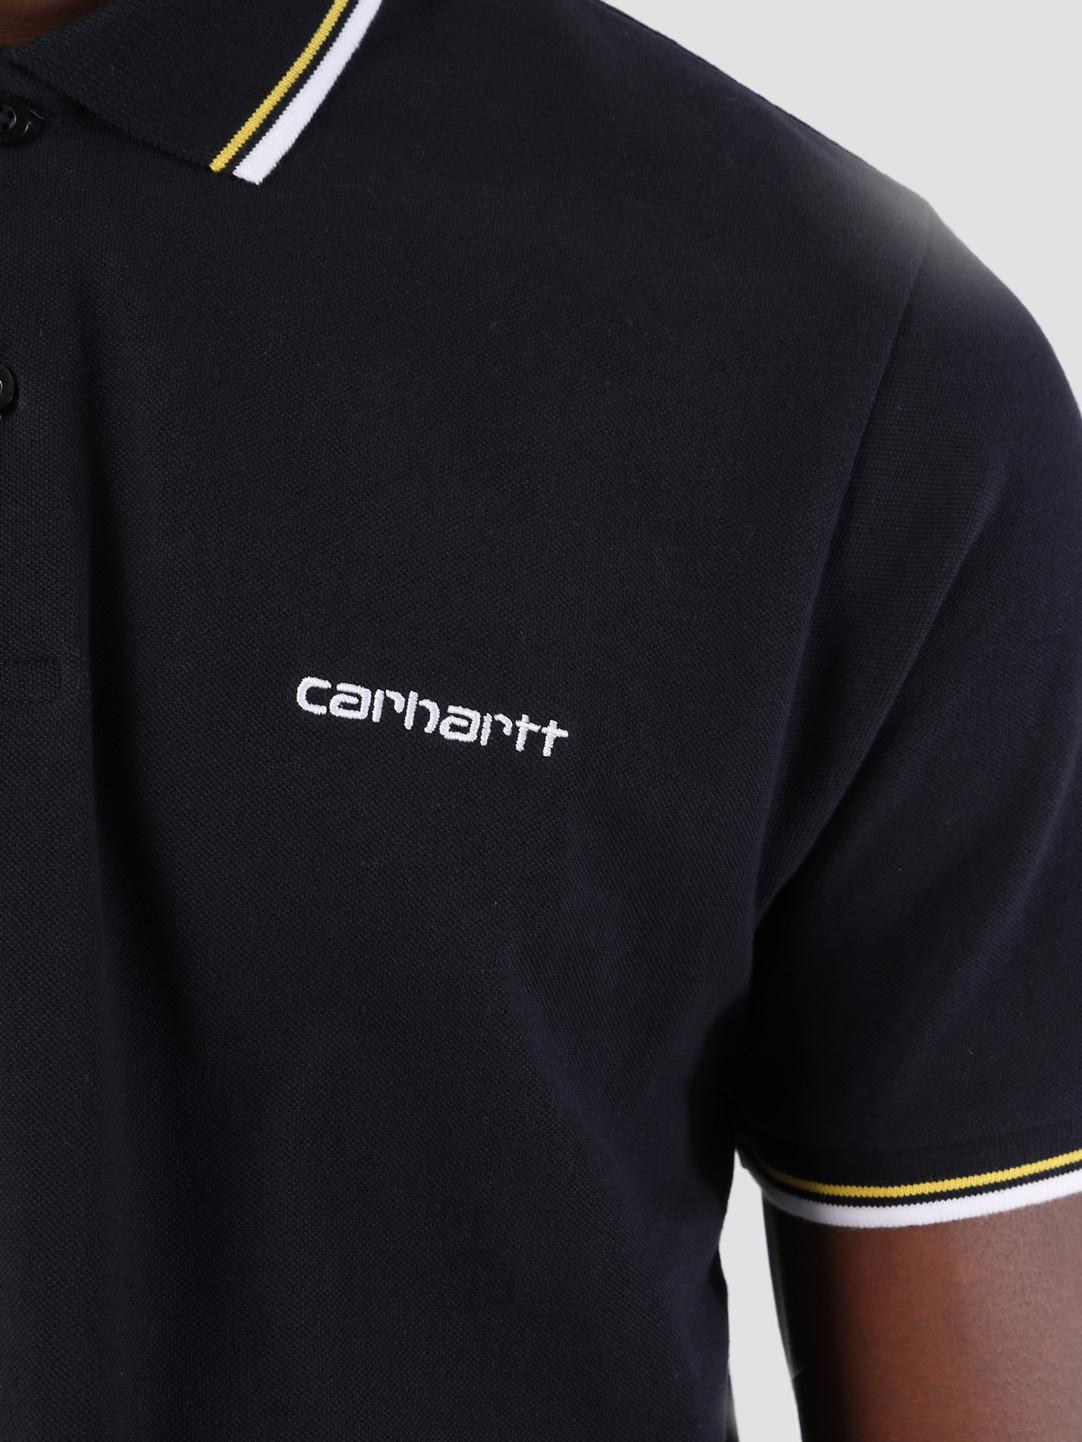 Carhartt WIP Carhartt WIP Script Embroidery Polo Dark Navy White Primula I026244